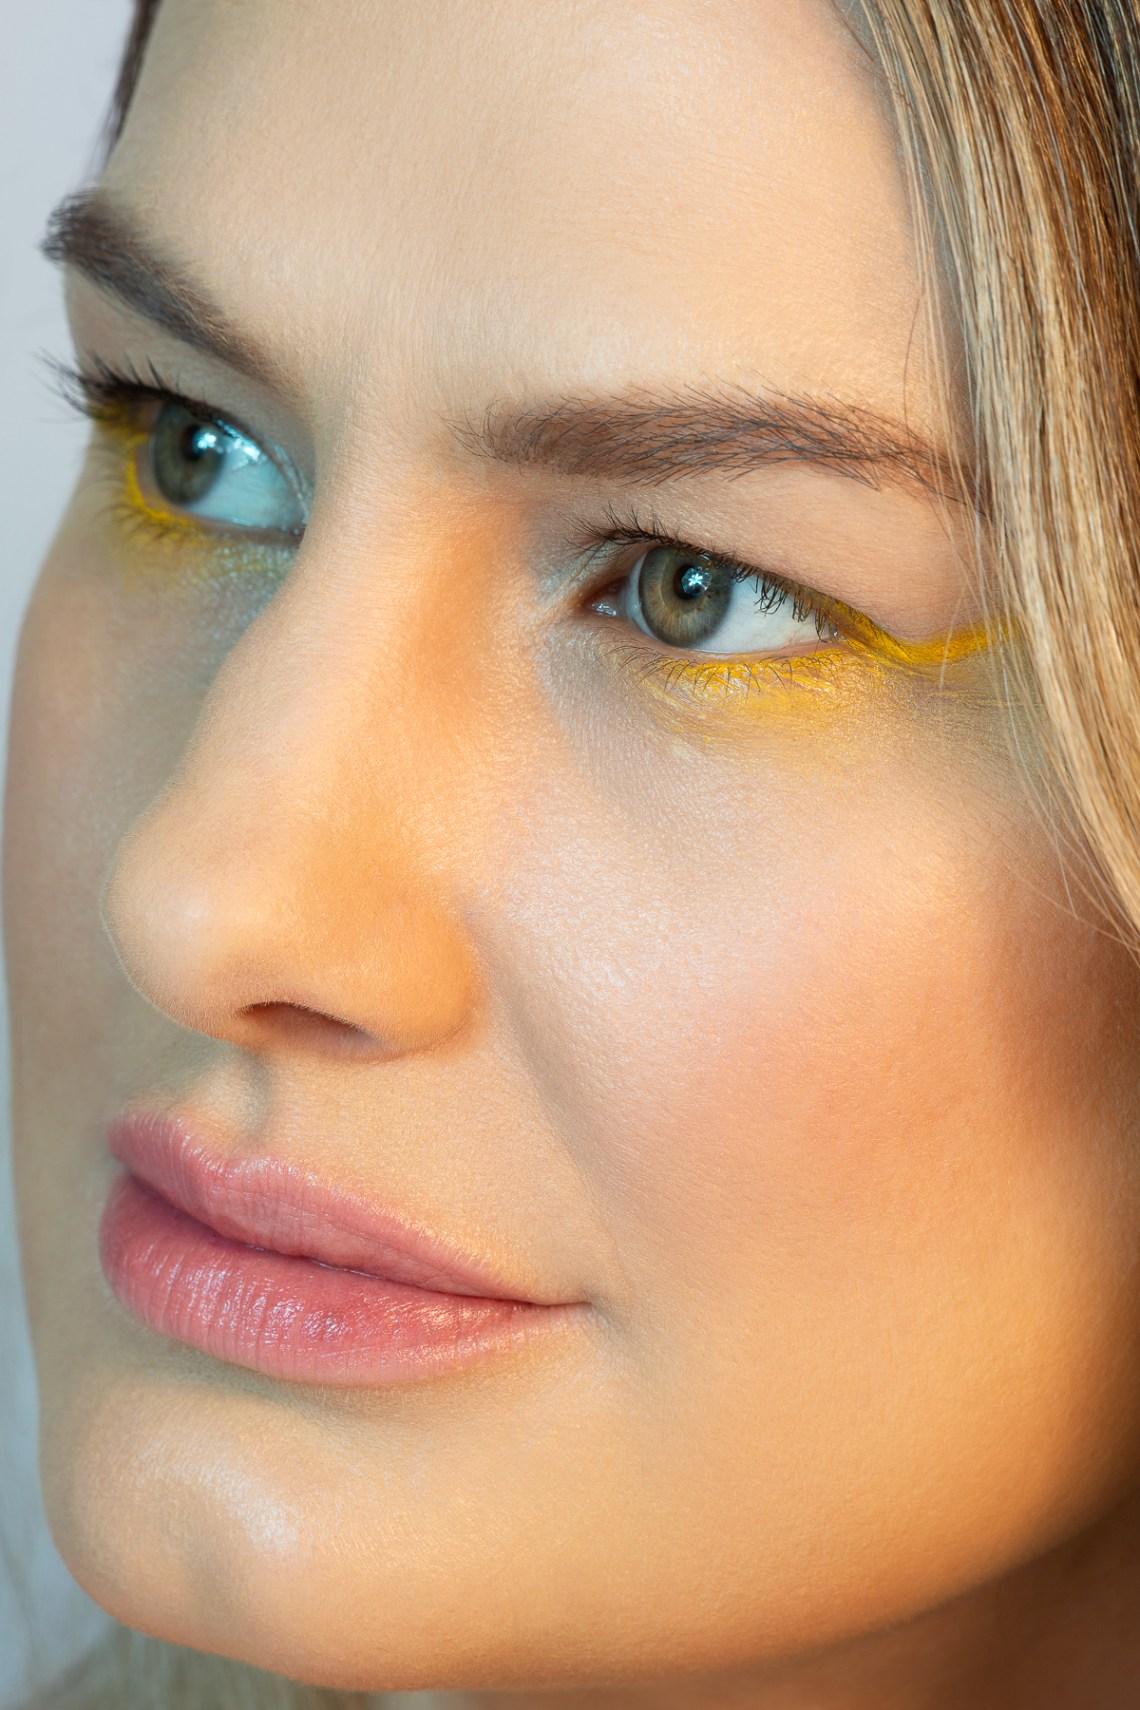 San Francisco beauty photographer Ella Sophie, beauty portrait of blond model with yellow eye makeup